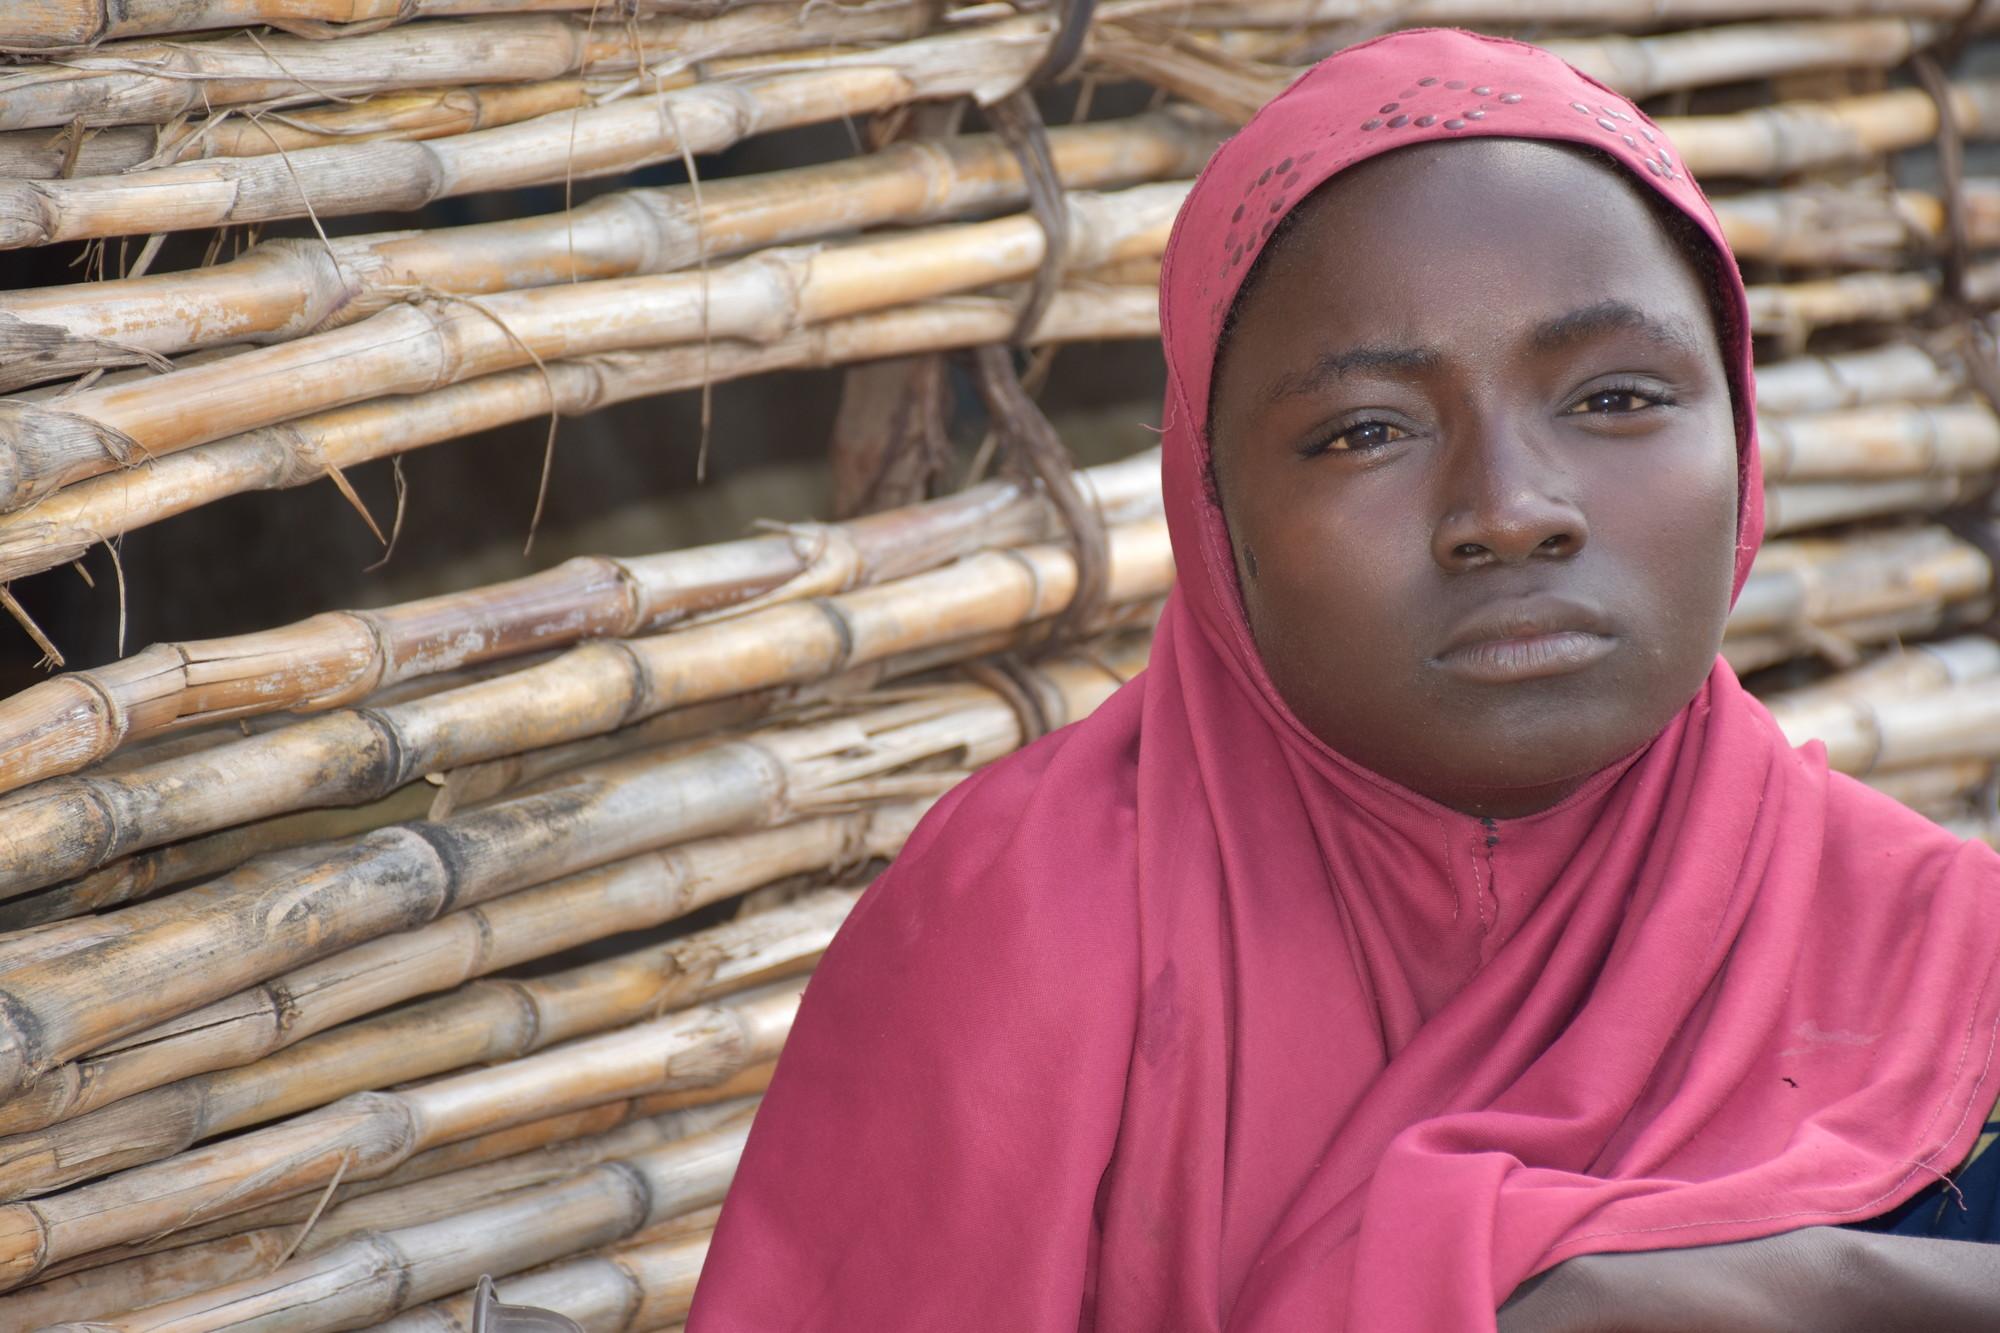 Photo: Rakietou Hassane Mossi/CARE